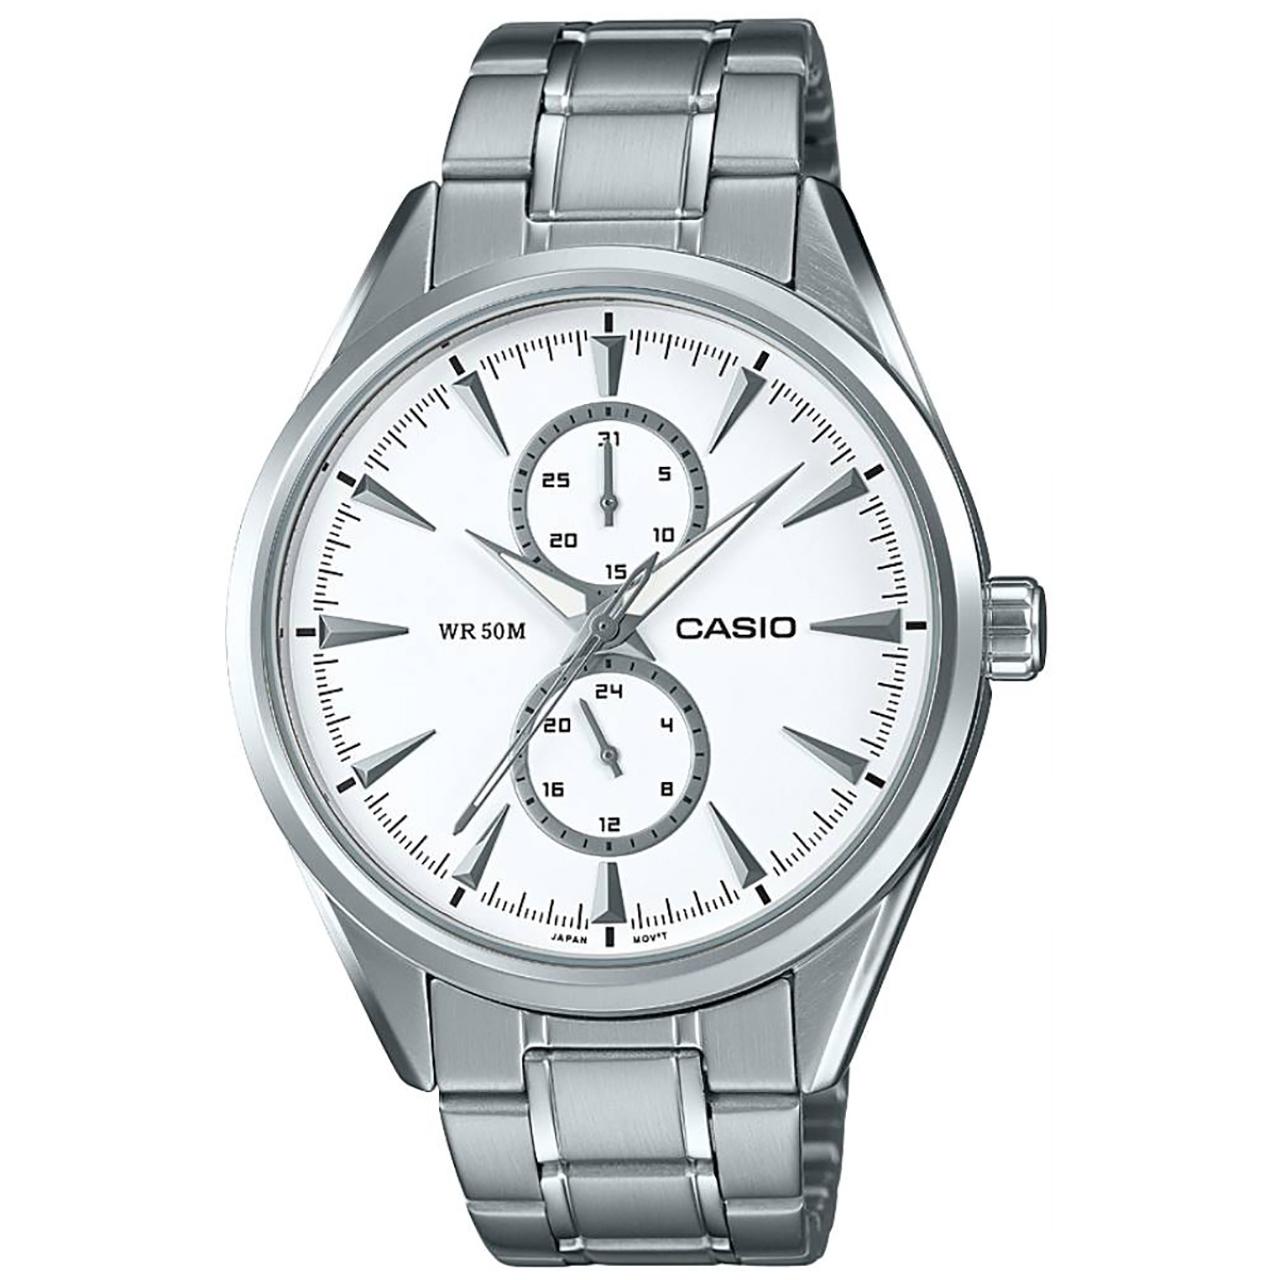 ساعت مچی عقربه ای مردانه کاسیو کد MTP-SW340D-7AVDF              خرید (⭐️⭐️⭐️)